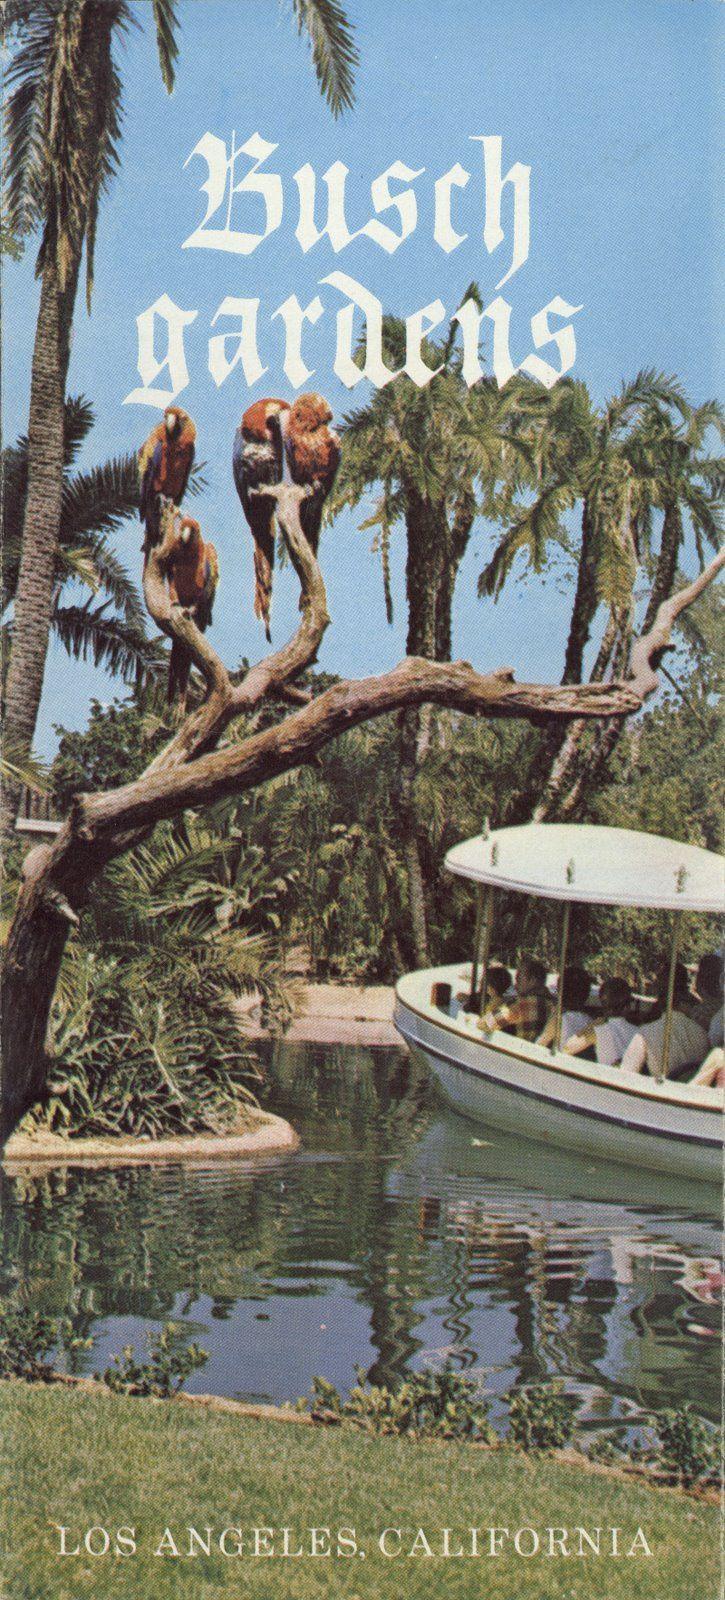 Busch Gardens Van Nuys Ca Closed 1979 The Brewery Remains Btw San Fernando Valley